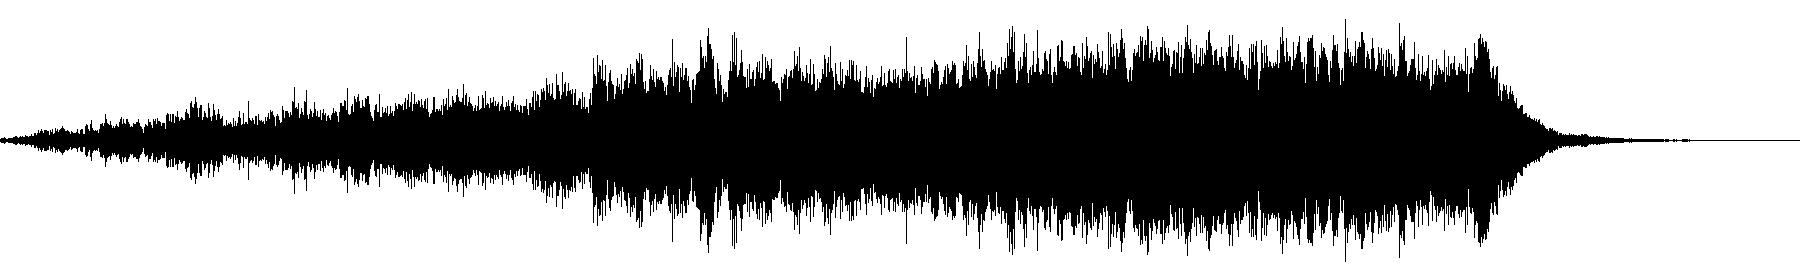 str fx b 08 xc